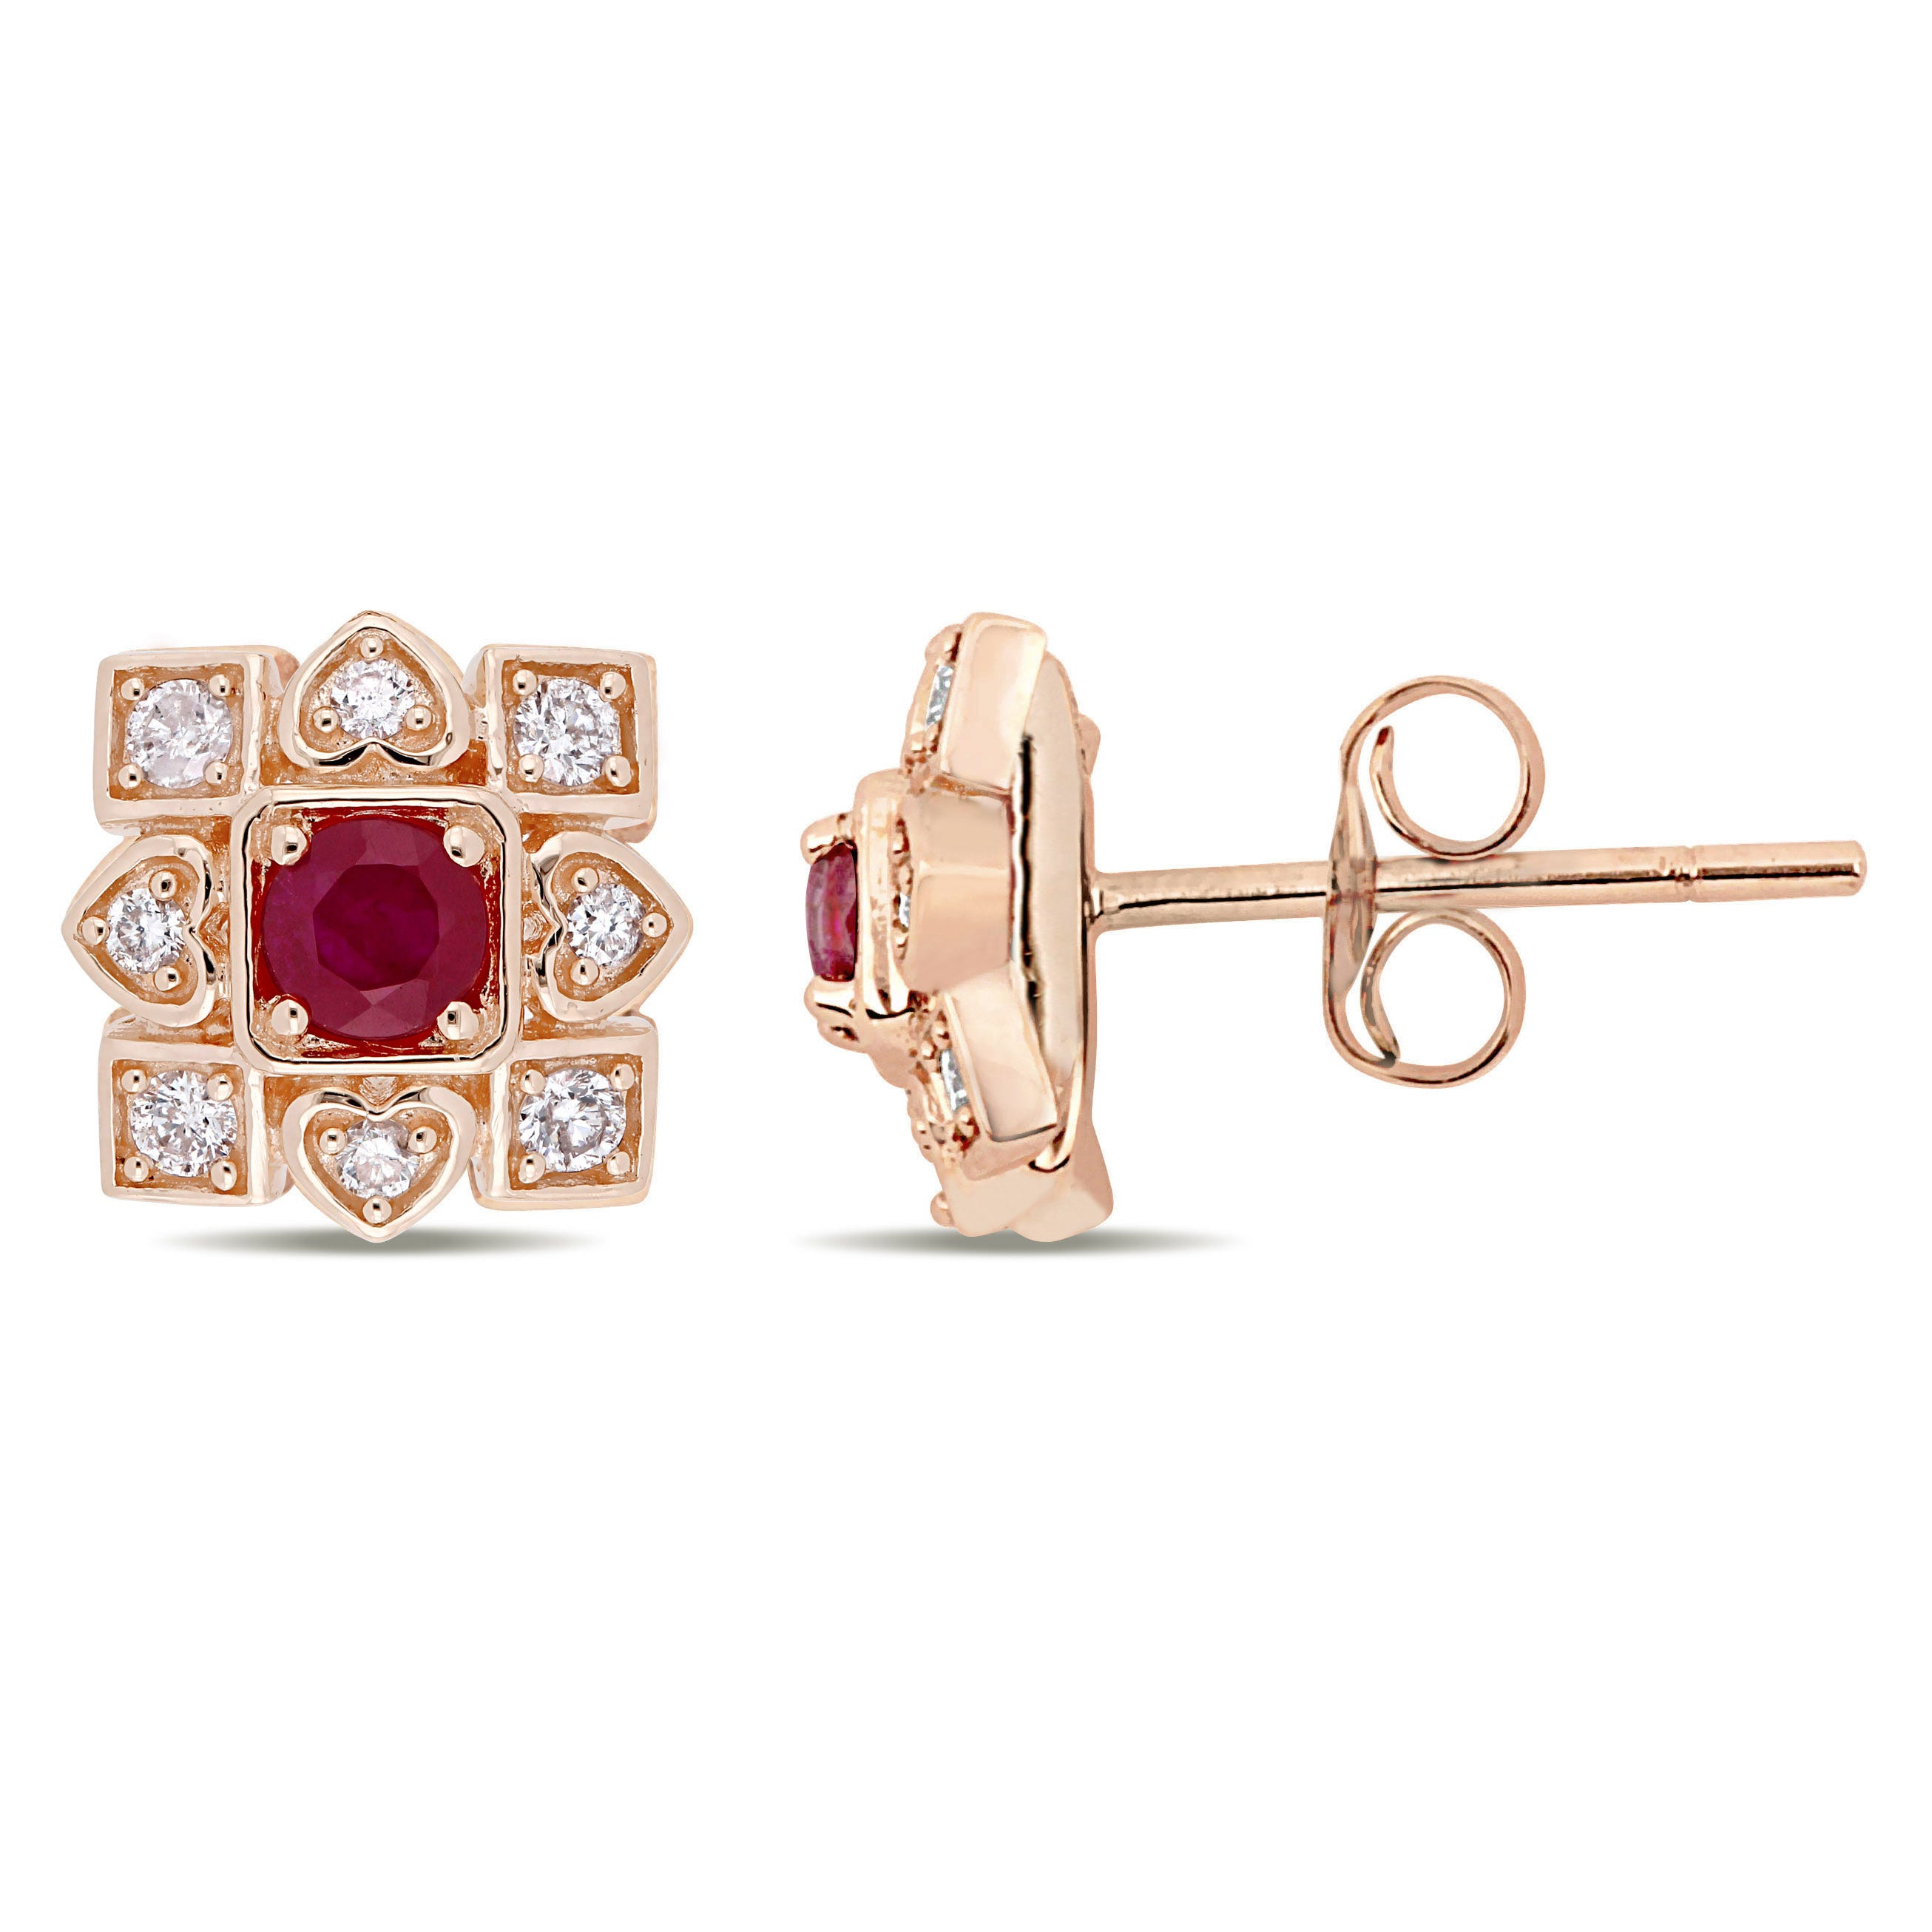 Everly Diamond & Ruby Stud Earrings in 10k Rose Gold